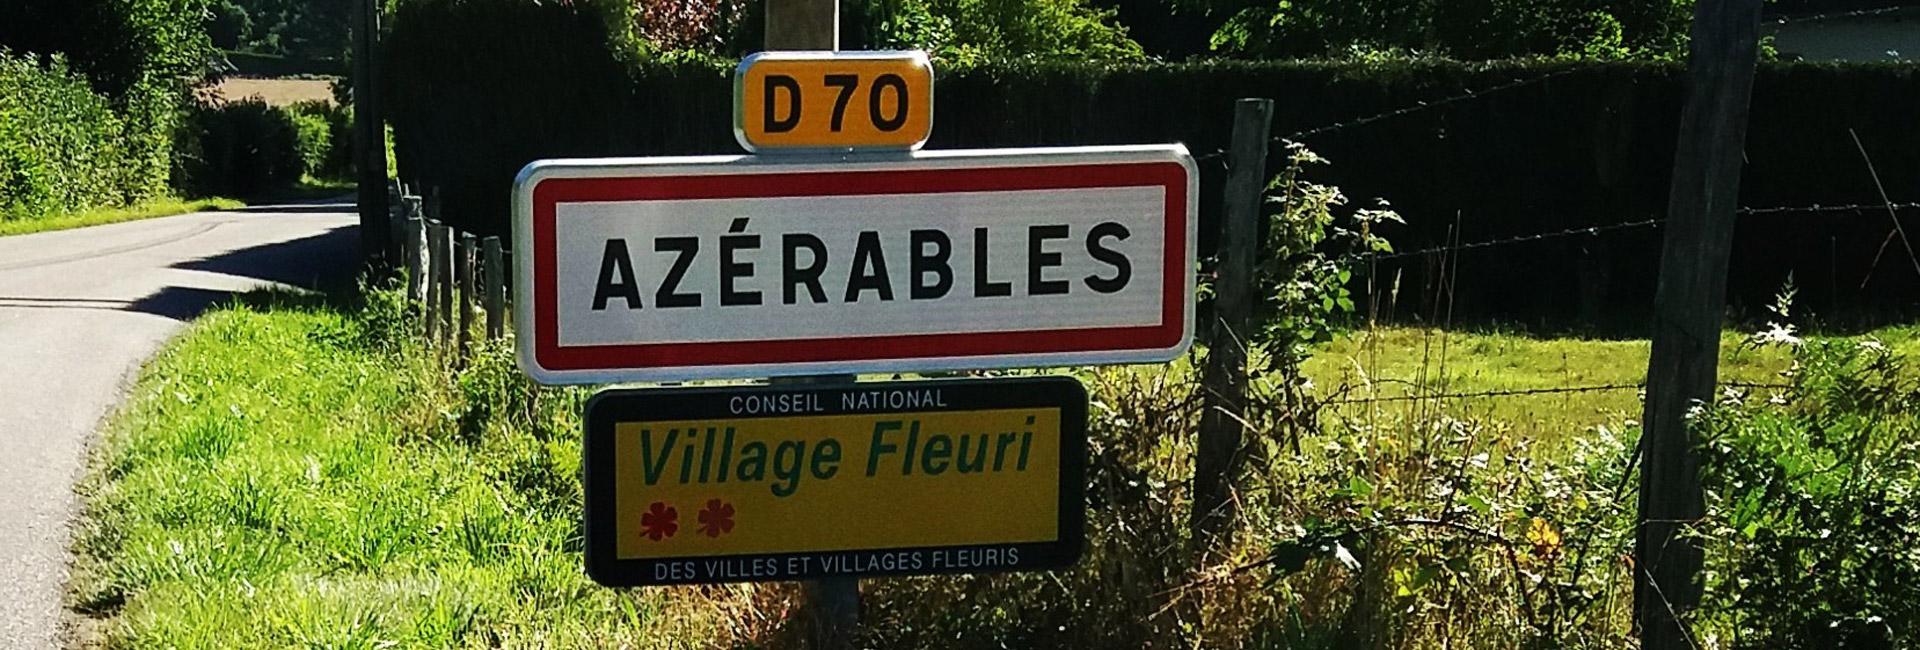 Azérables